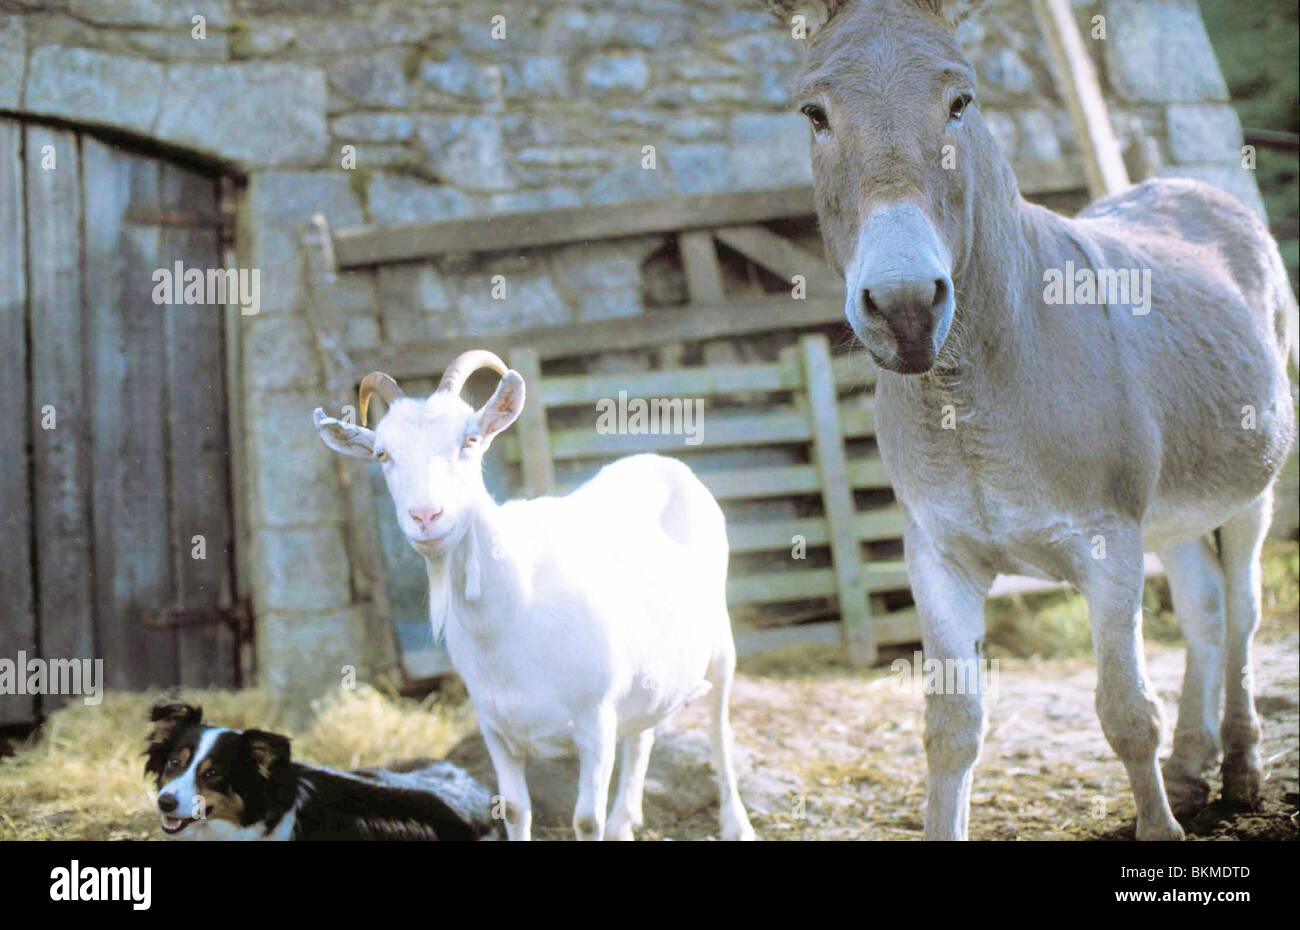 ANIMAL FARM (TVM) -1999 - Stock Image